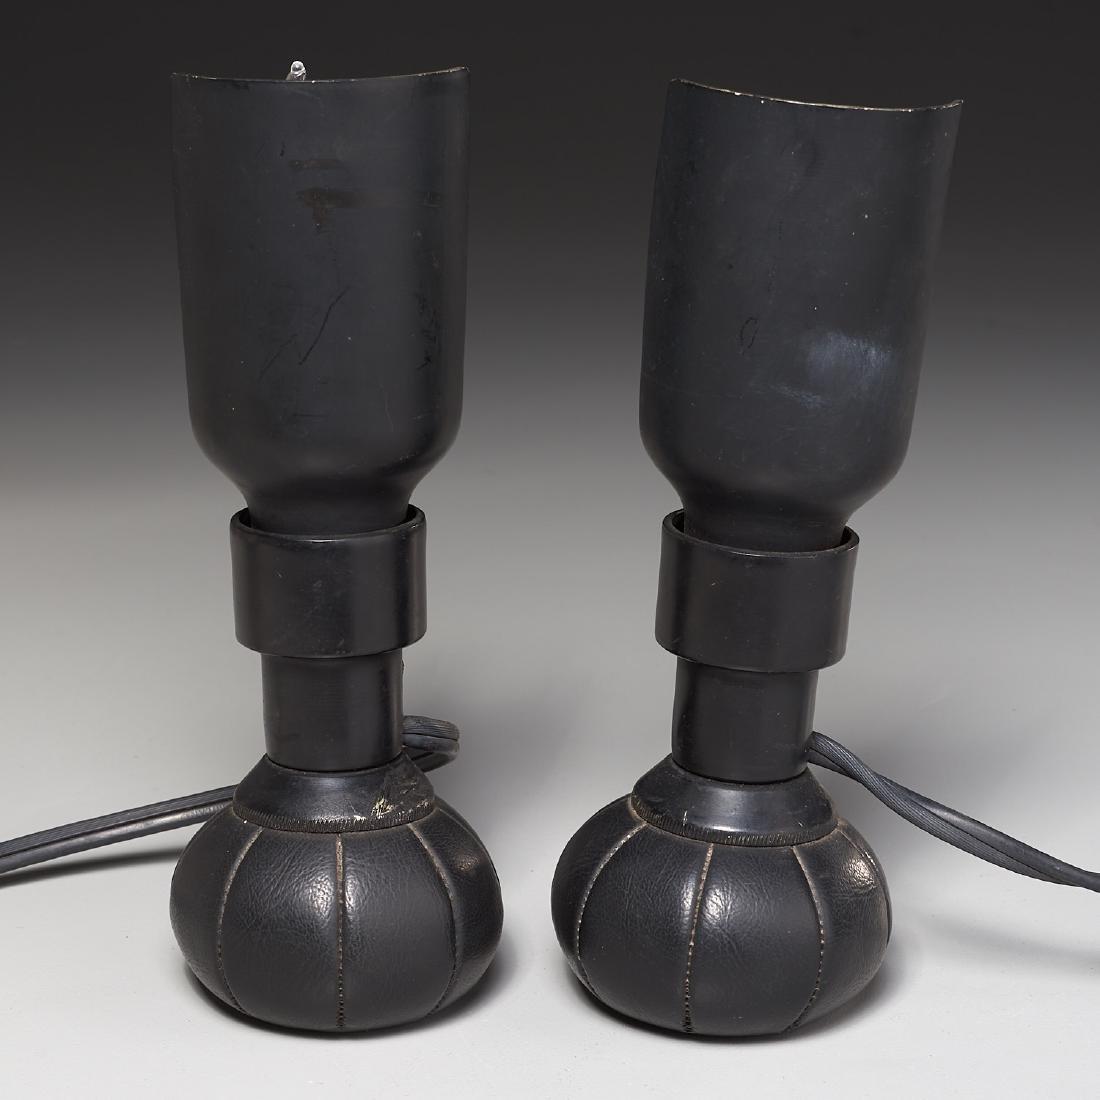 Pair Gino Sarfatti table lamps - 6